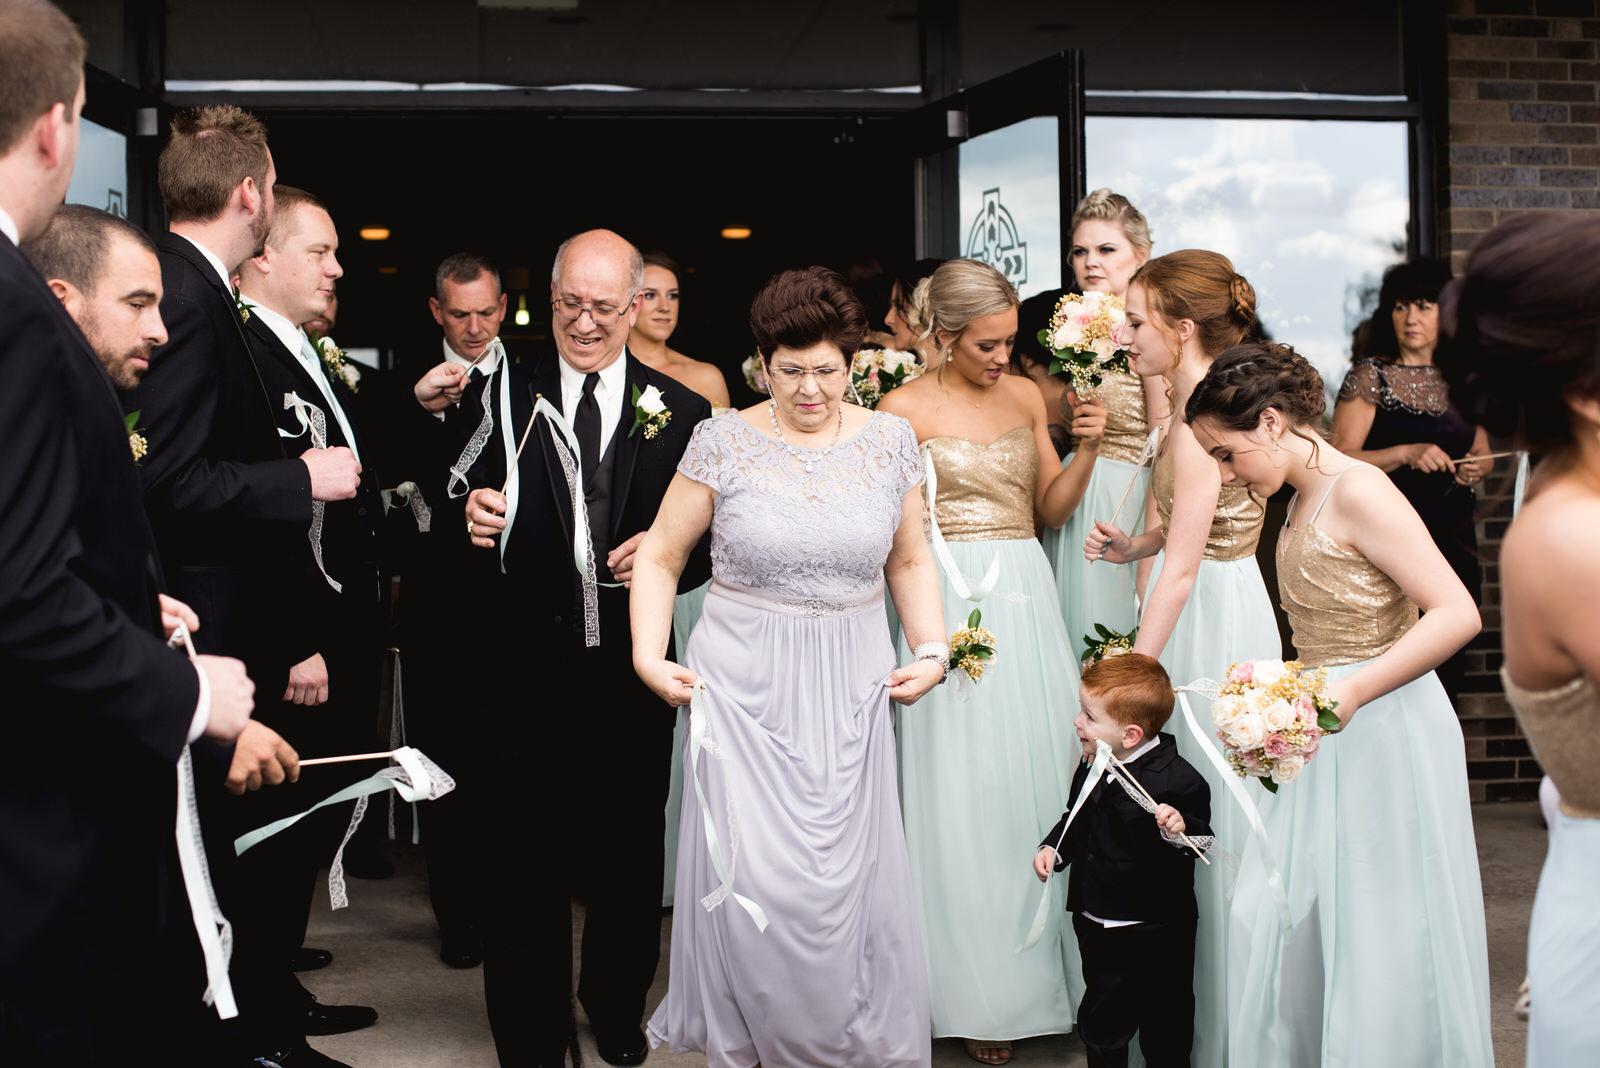 Laube_Banquet_Hall__Wedding_Photos_008.jpg